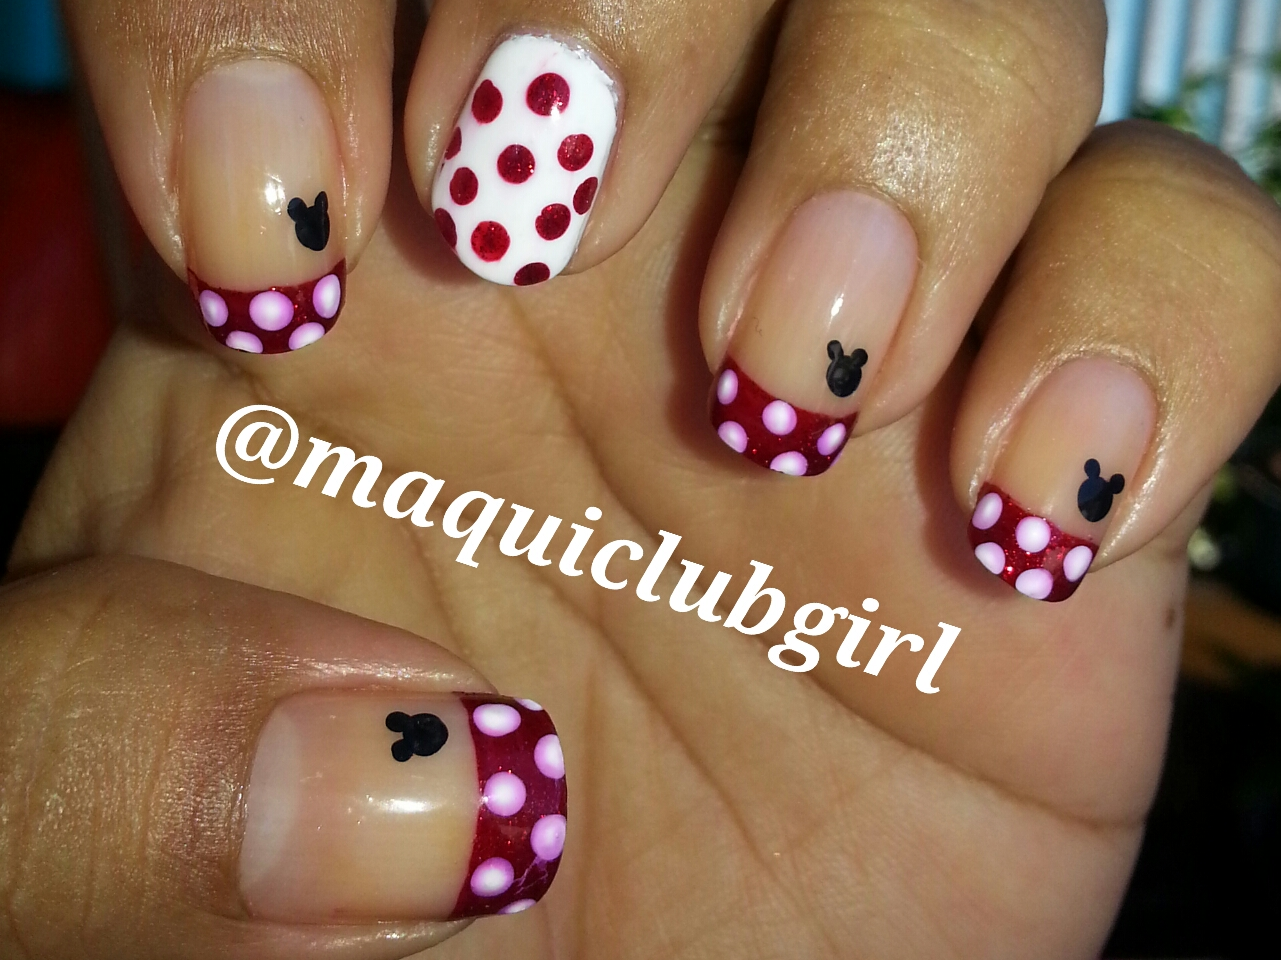 MAQUICLUB GIRL: ABC de la Uñas (M de Mickey Mouse)